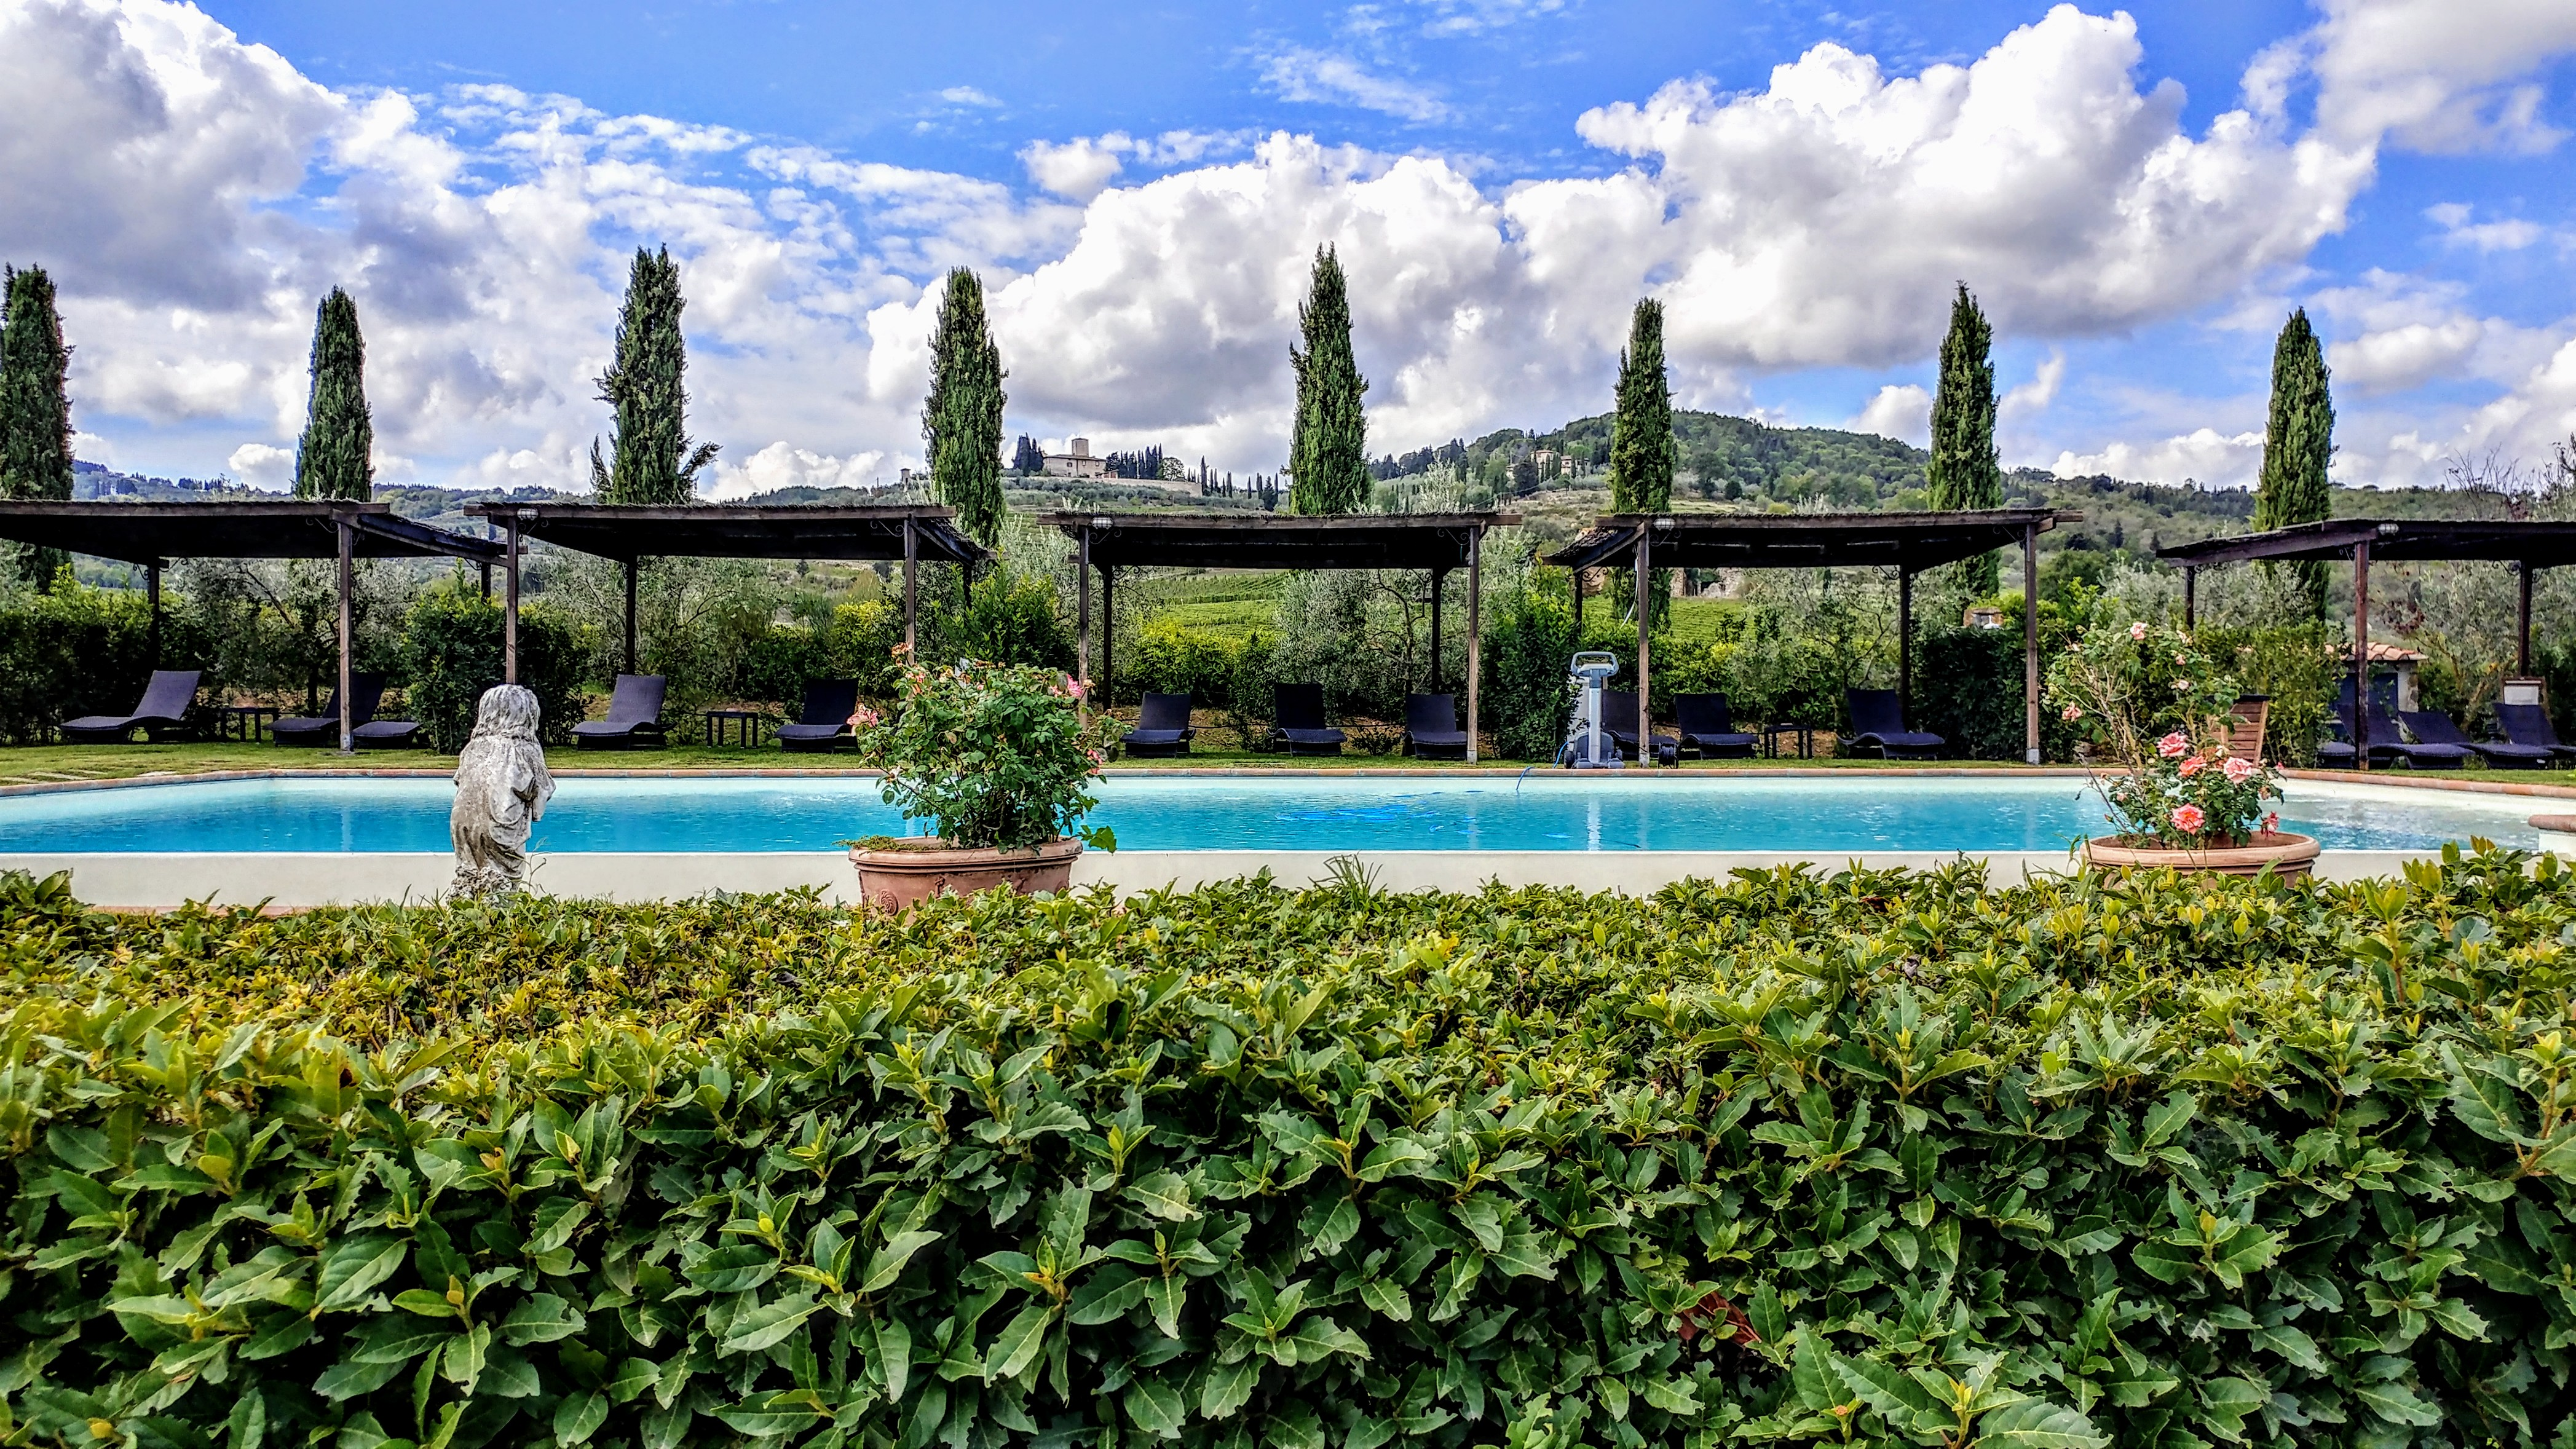 Italie Florence Europe voyage destination paysage Chianti vignoble vin